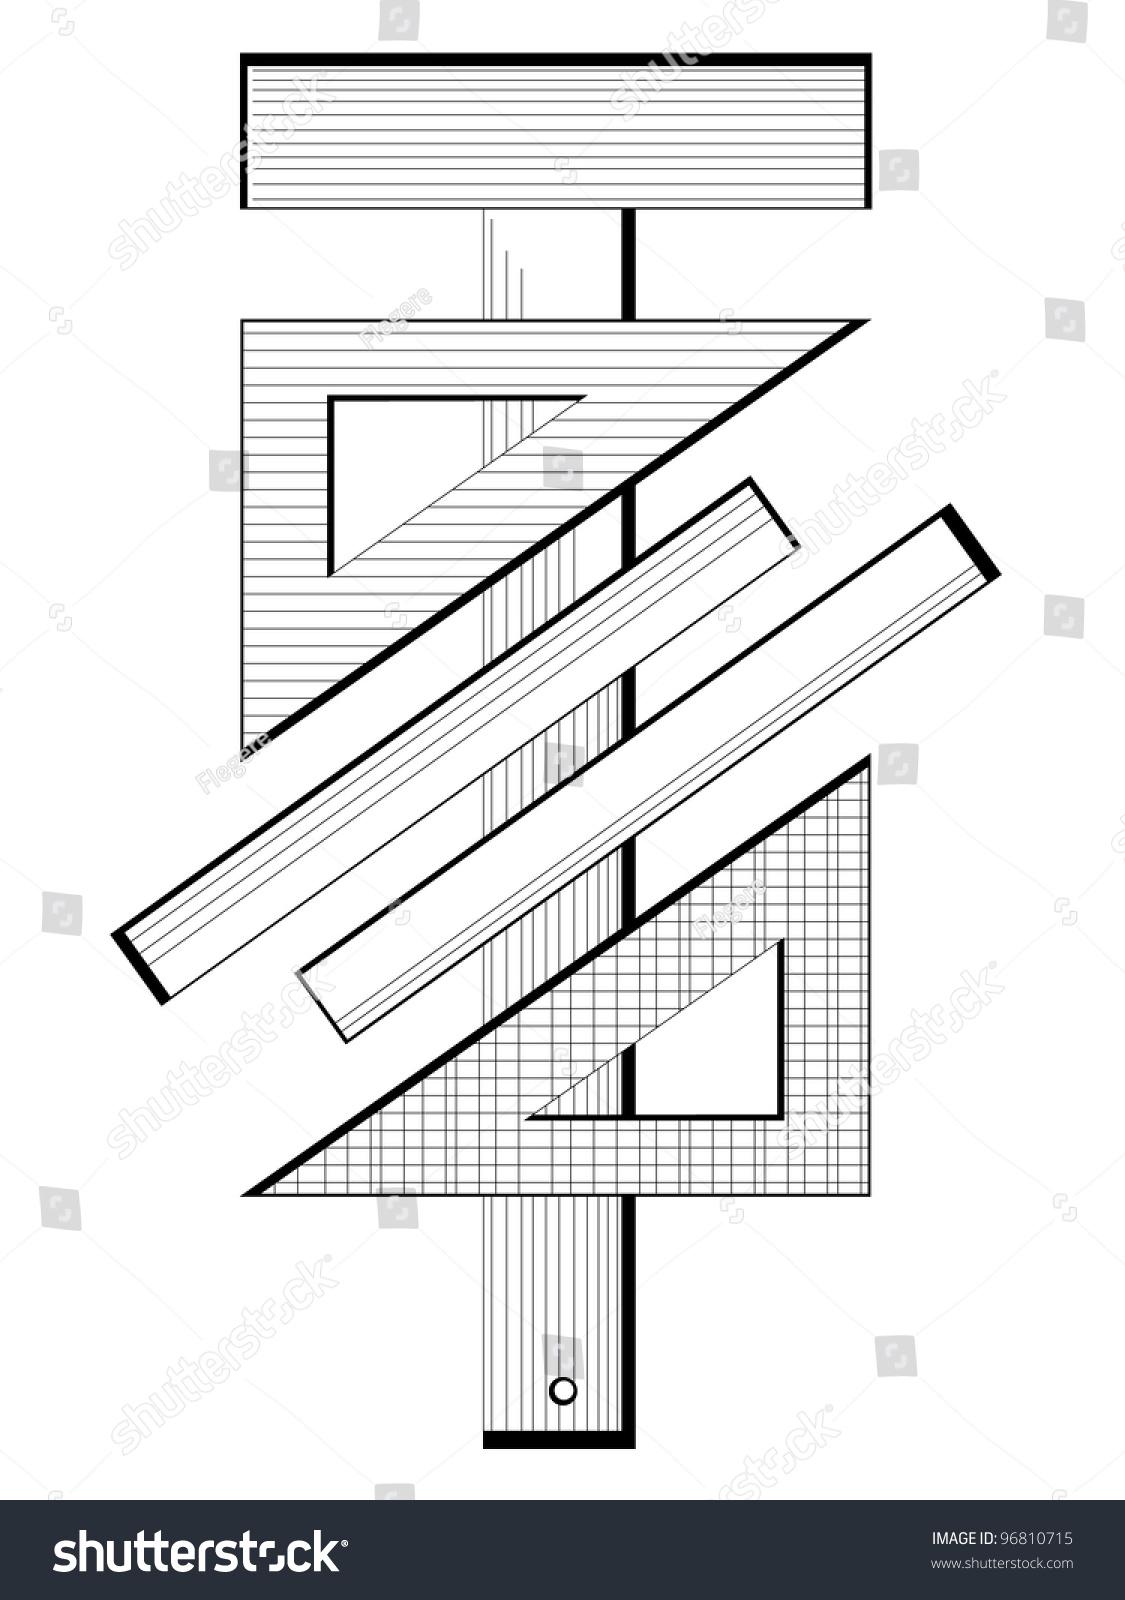 Engineering Measuring Instruments : Measuring instruments engineering symbol stock vector